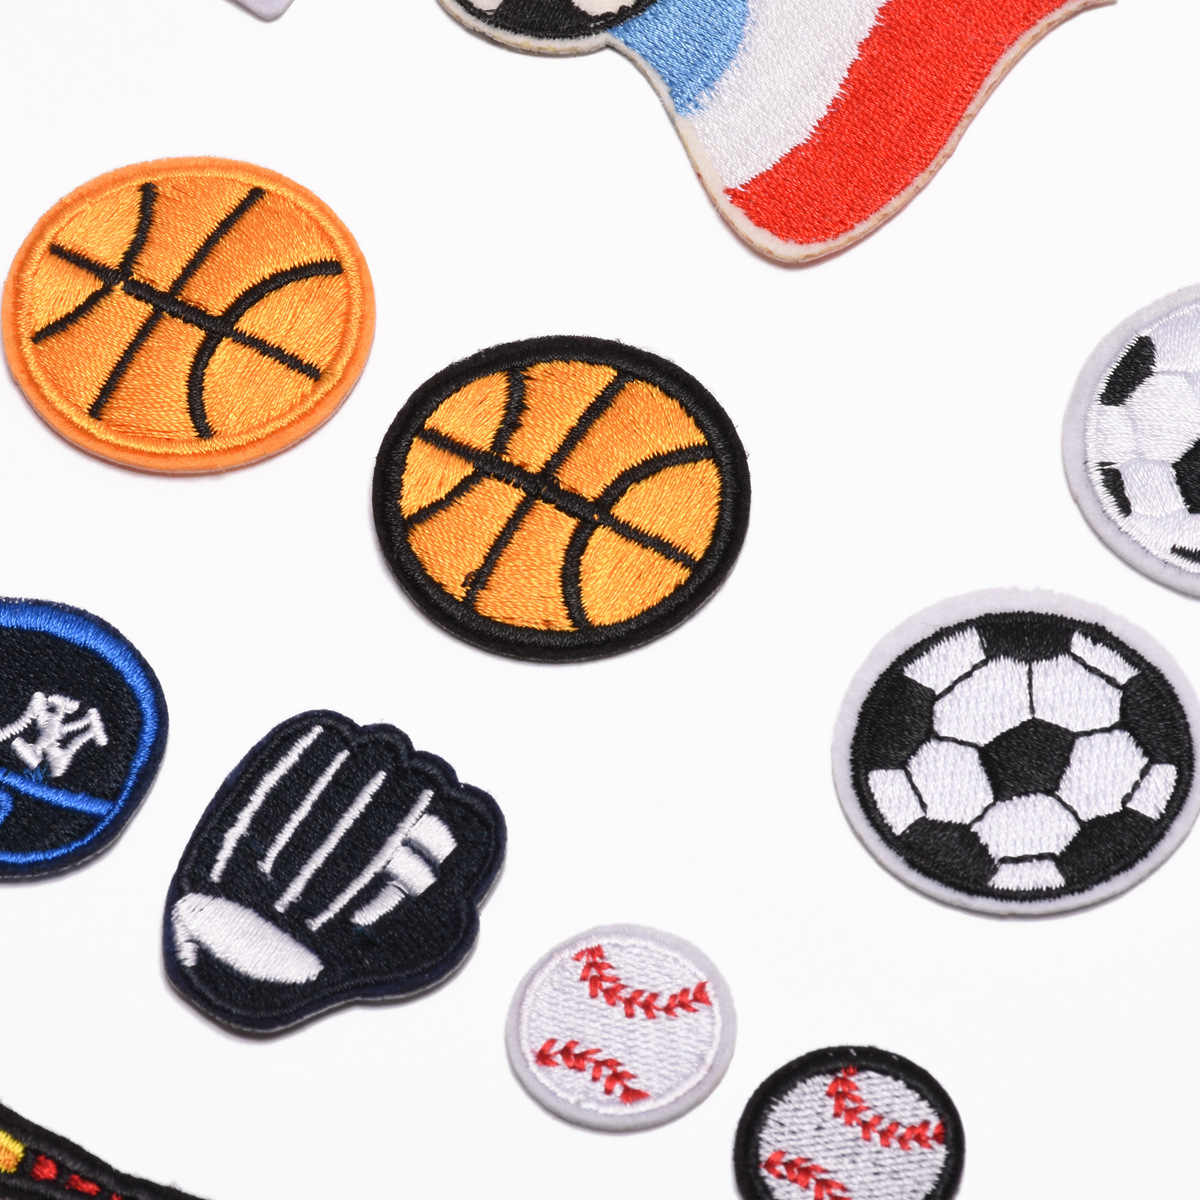 Pegamento con respaldo de viento euroamericano paño bordado pegar baloncesto, voleibol, Rugby, nuevo fútbol de dibujos animados 2019